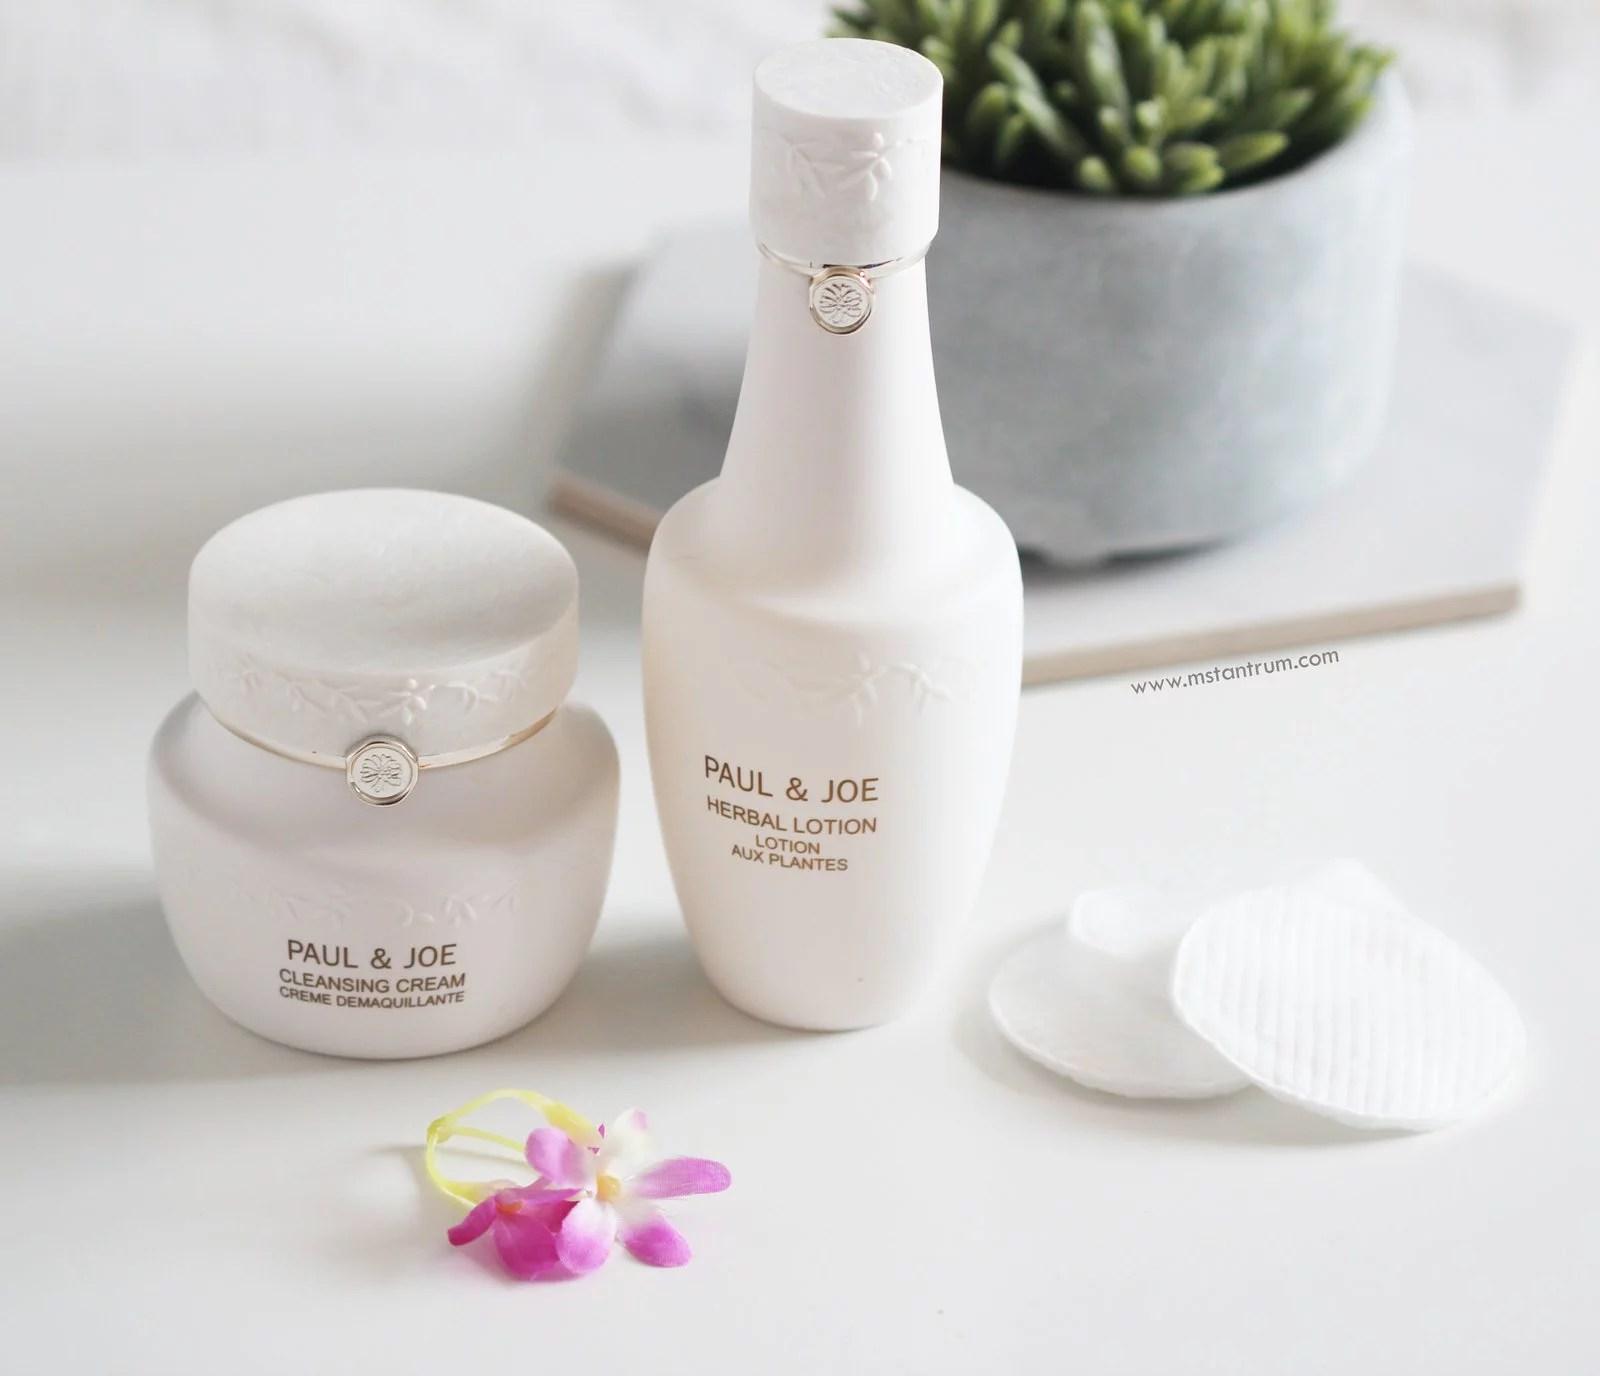 Paul & Joe Baeute cream cleanser & Herbal Lotion